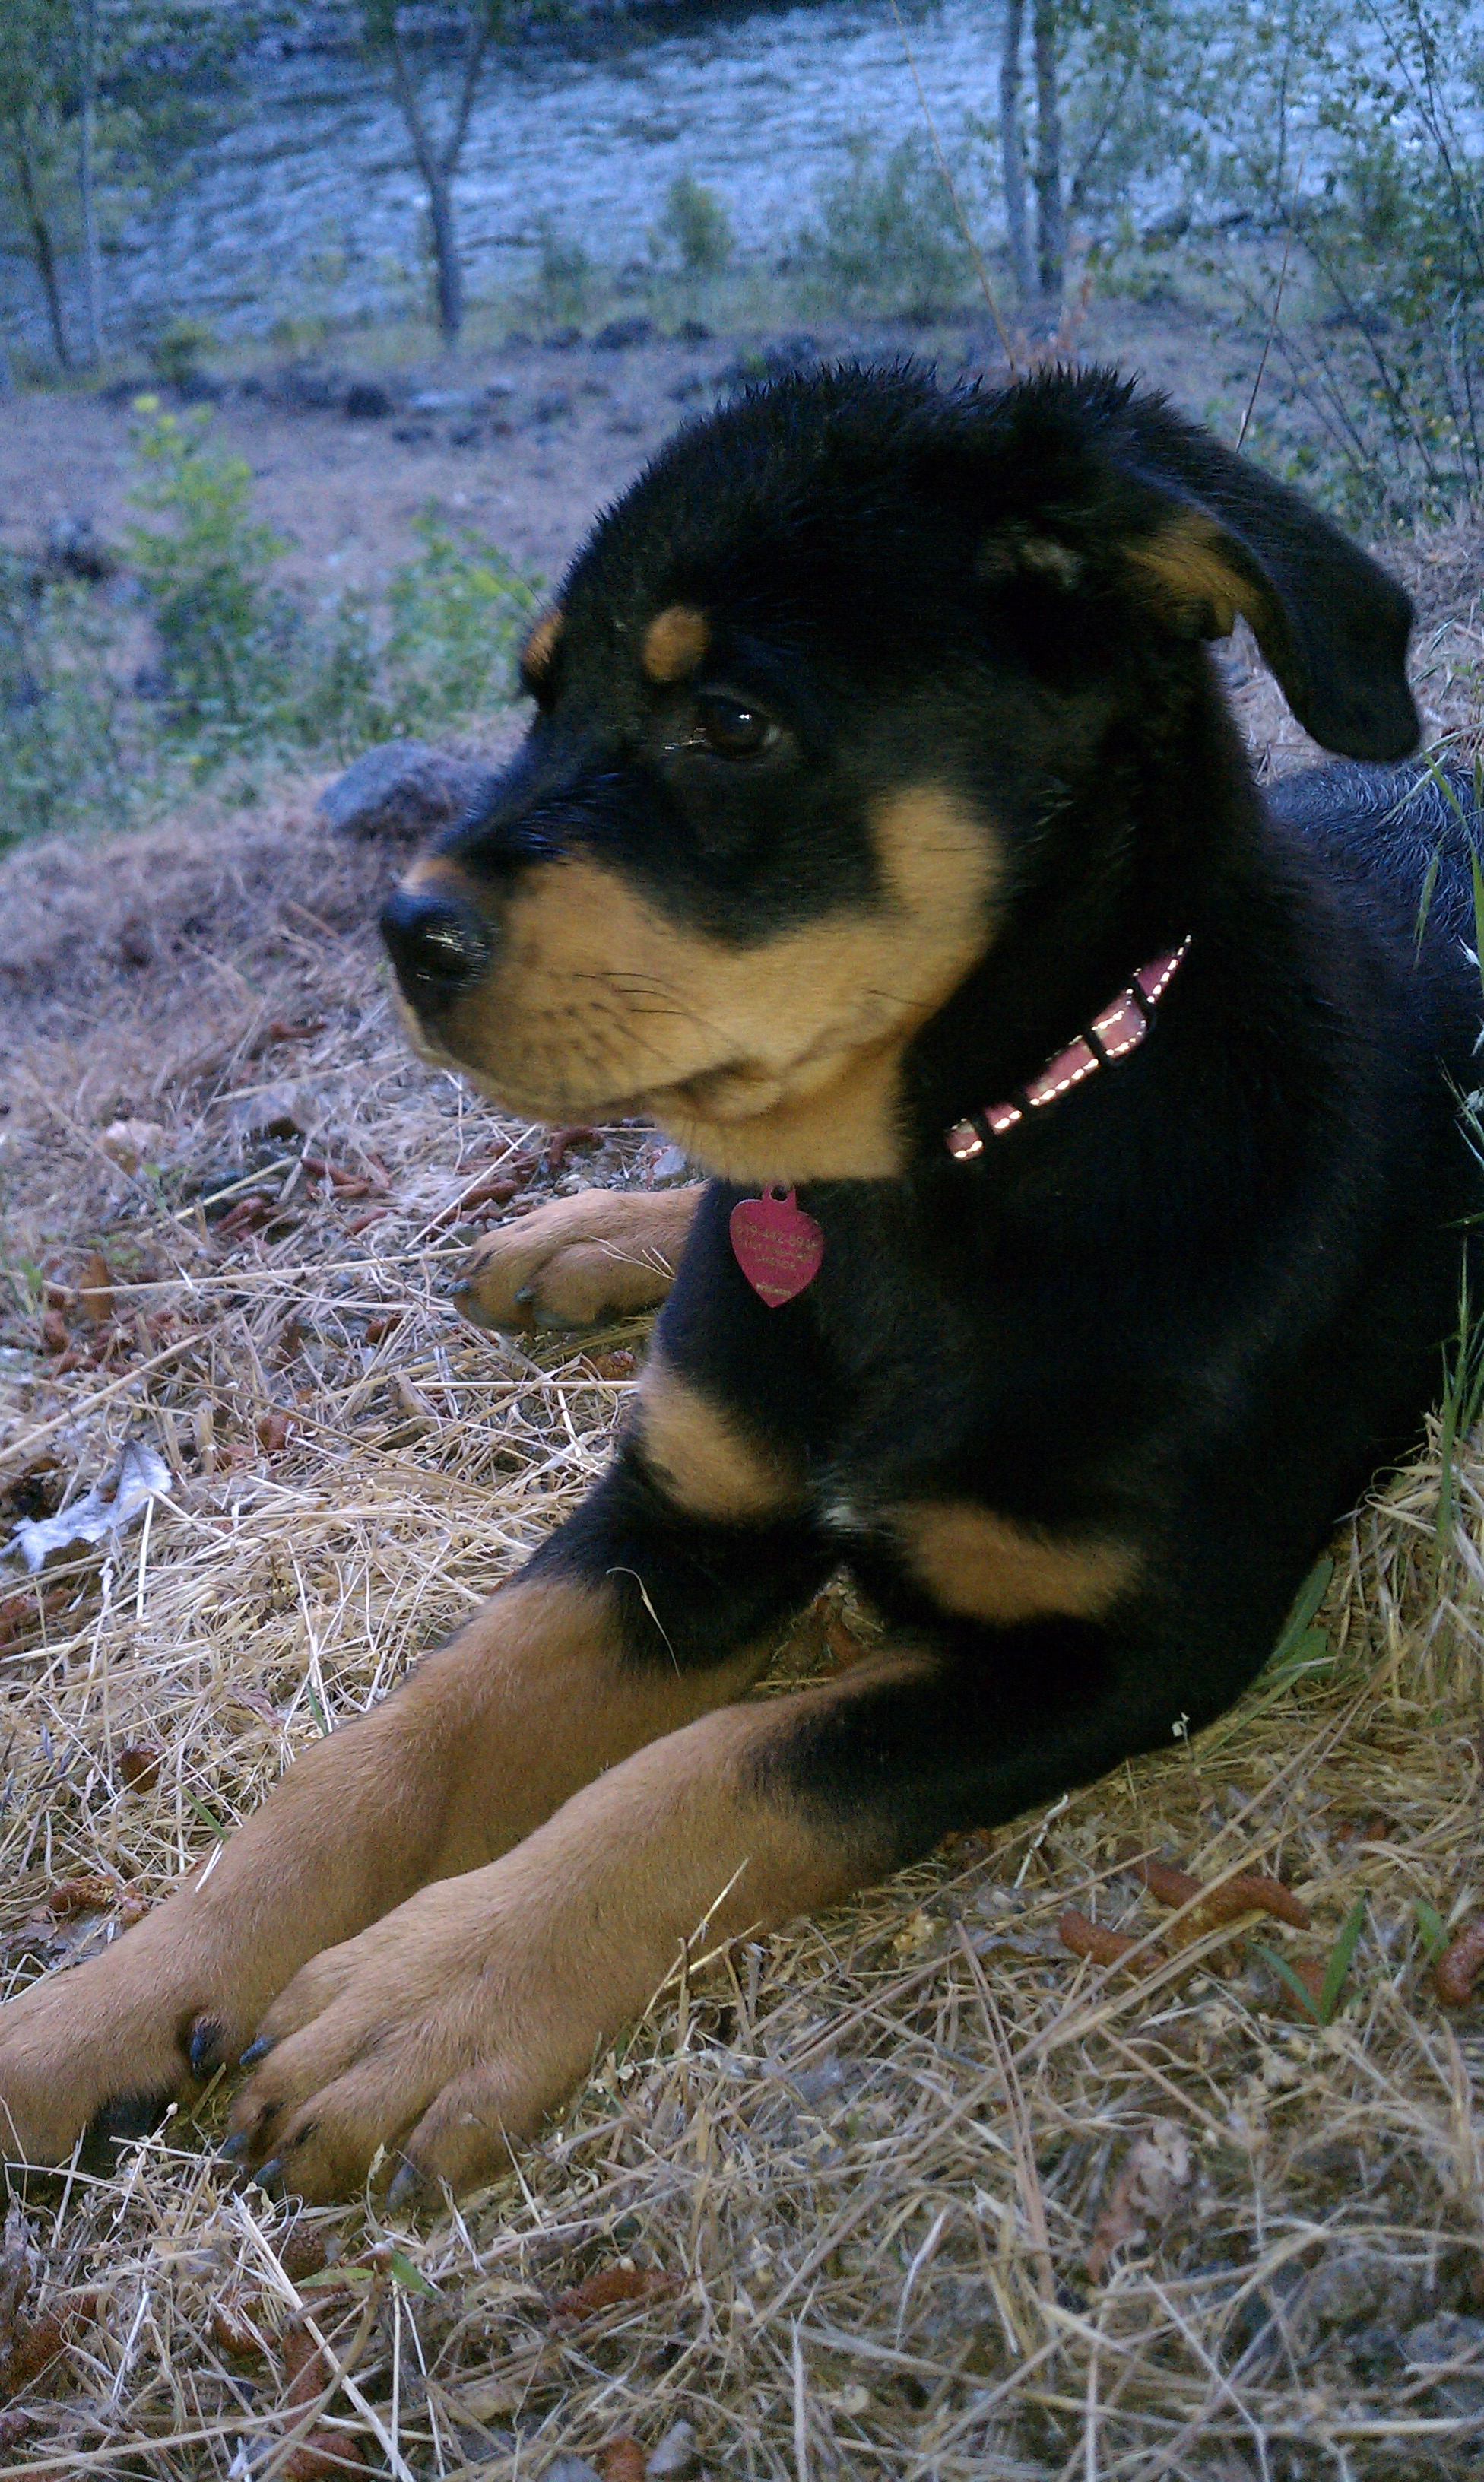 File:10-week-old Rottweiler puppy Rottweiler 2.jpg - Wikipedia